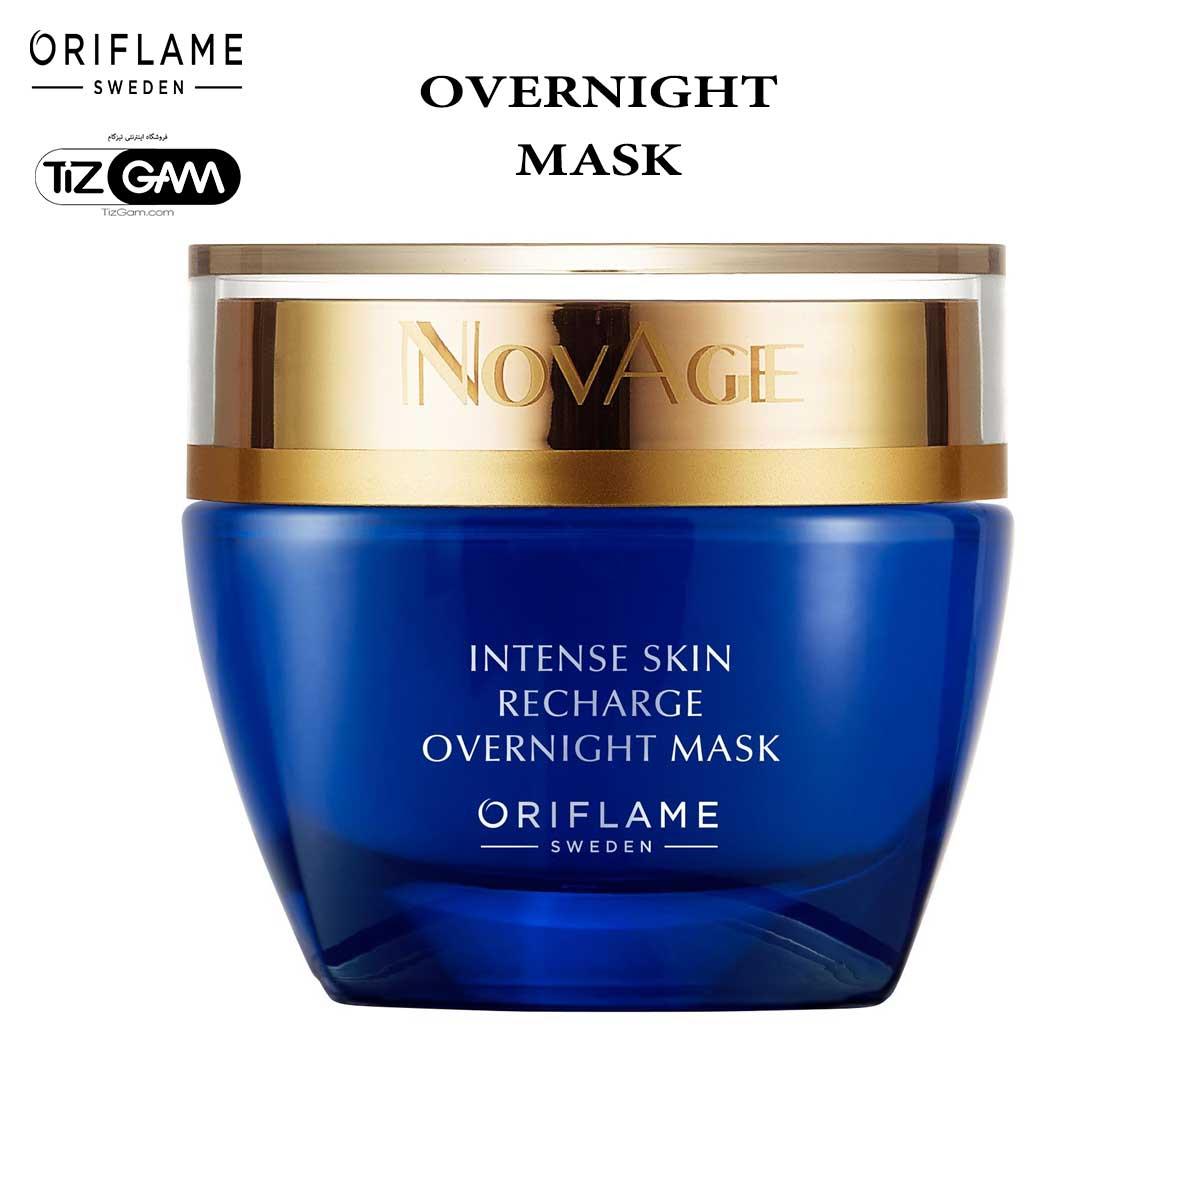 ماسک شب کلاژن ساز پوست صورت لیفتینگ شاداب ونرم نوایج اینتنس اسکین ریشارژ اوریفلیم تیزگام ORIFLAME NOVAGE INTENSE SKIN RECHARGE OVERNIGHT MASK 50ml TIZGAM